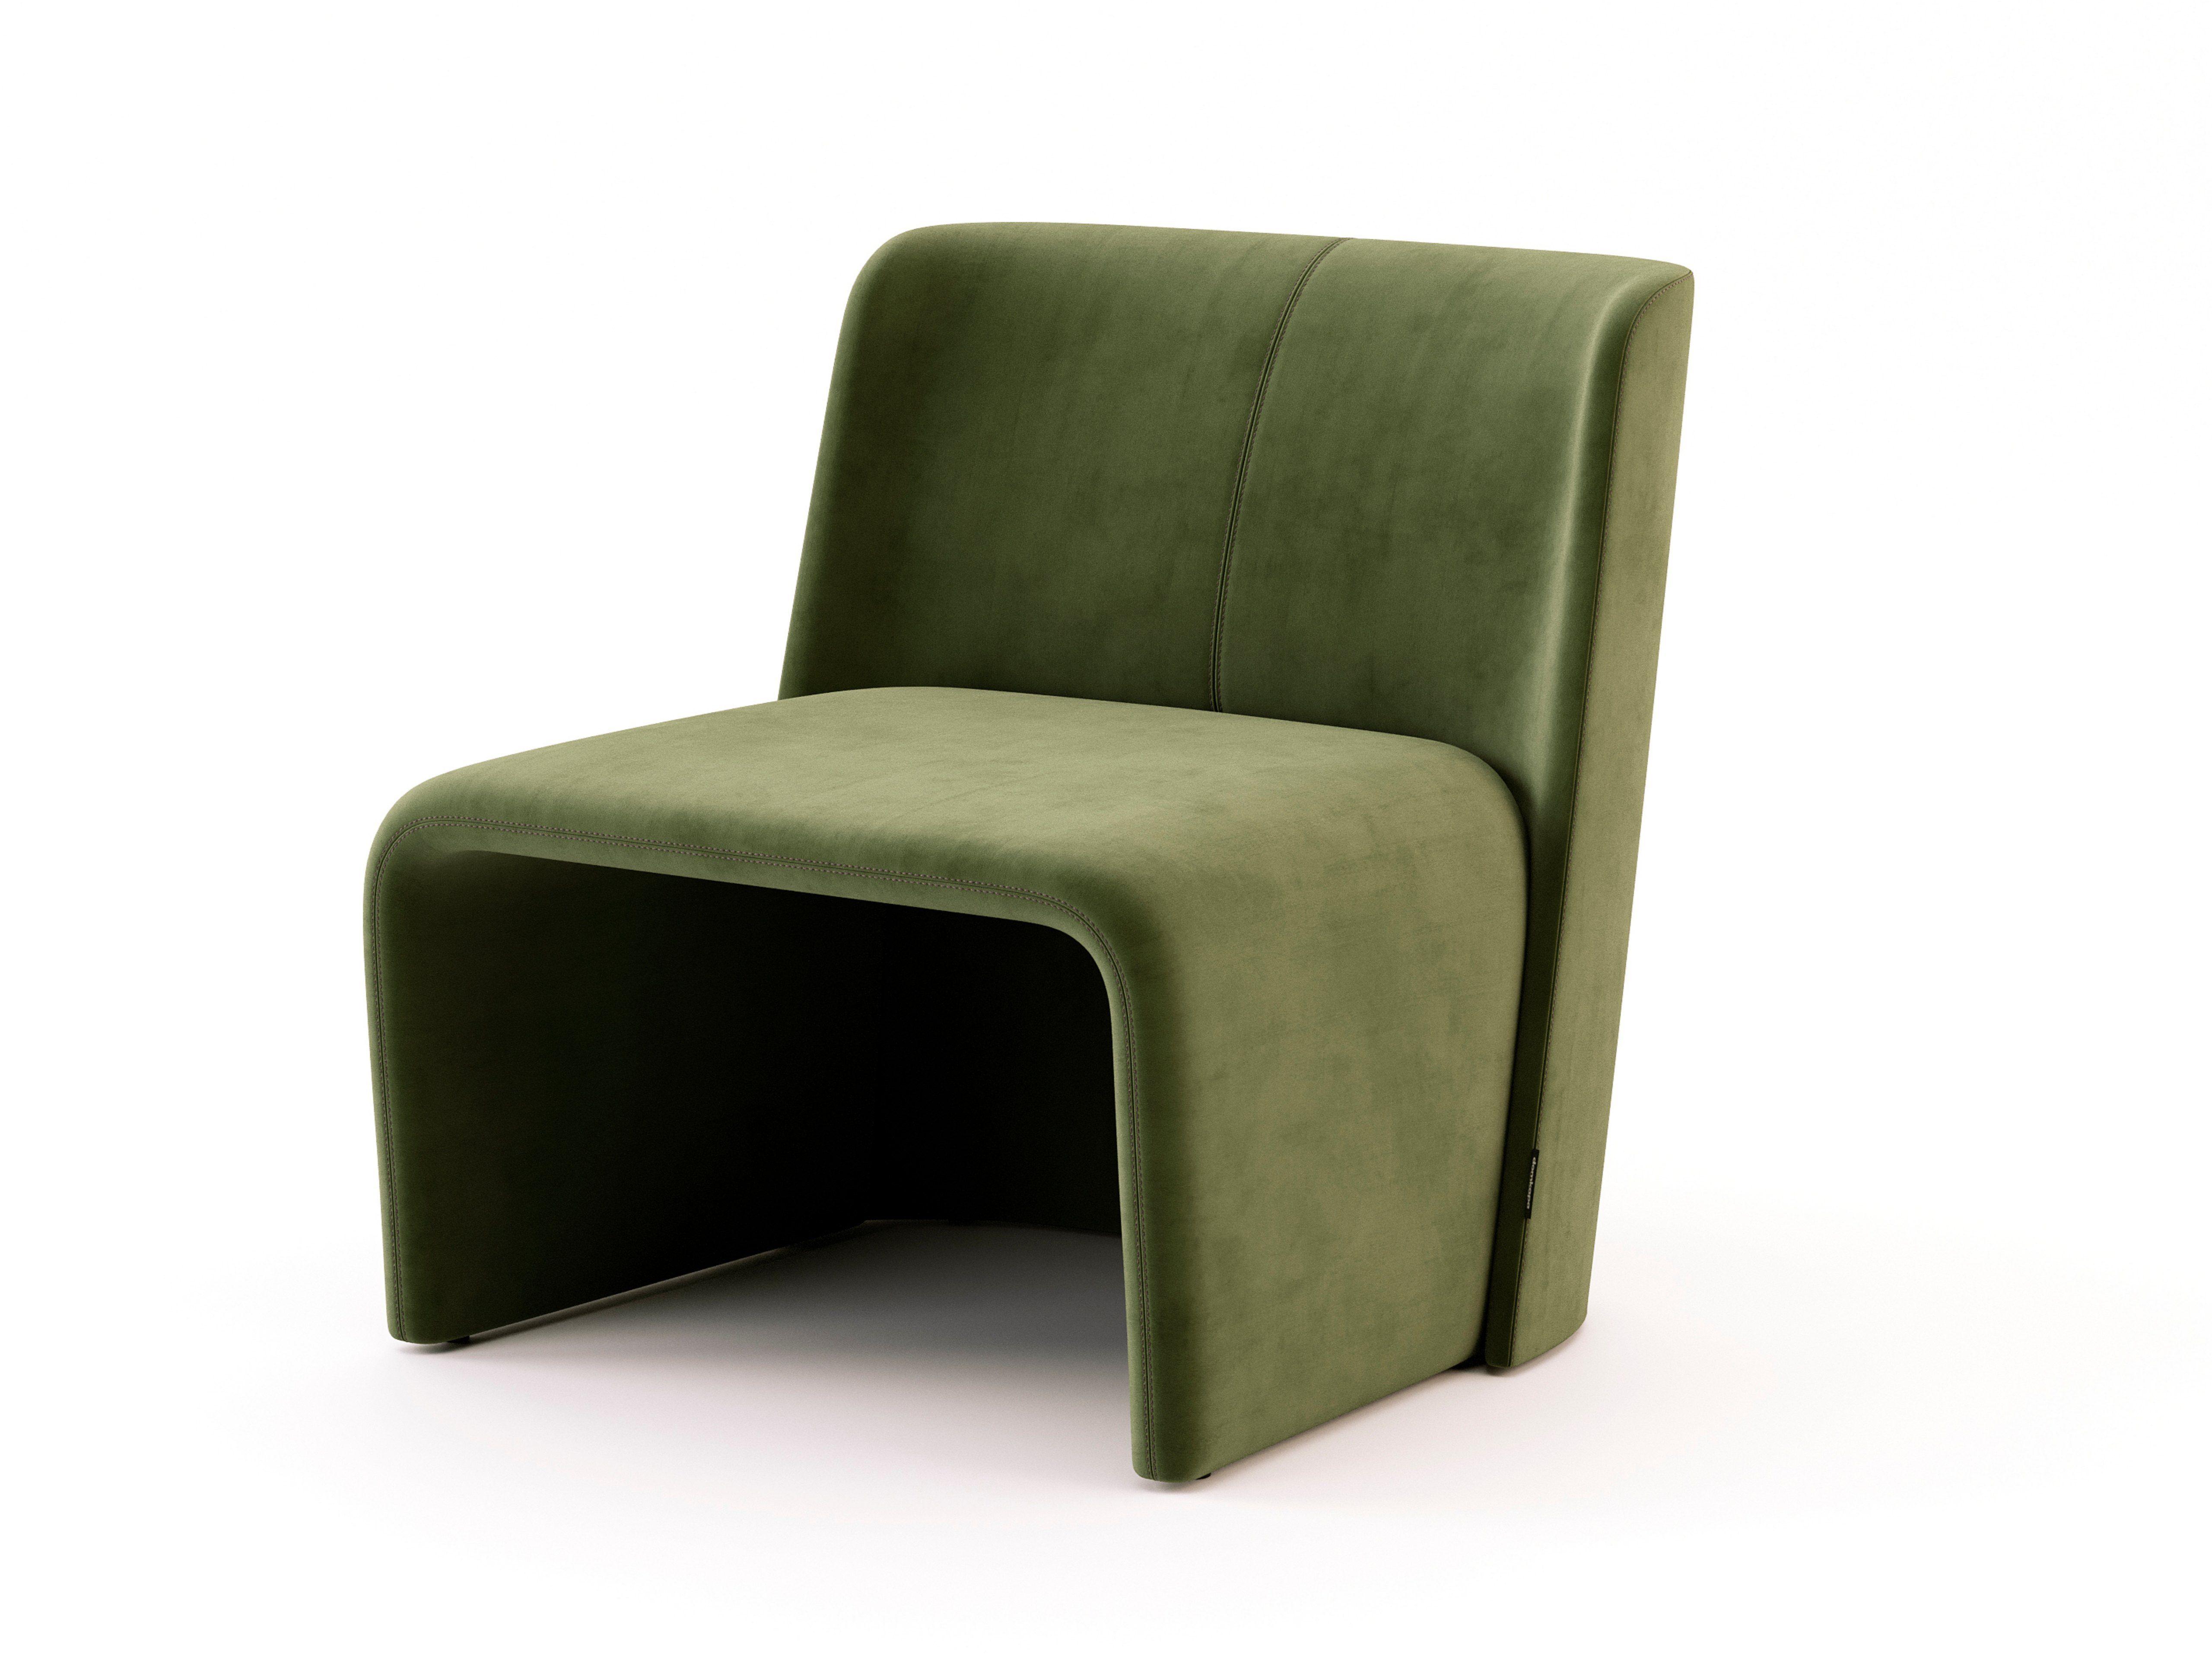 Velvet Armchair Legacy By Domkapa In 2020 Armchair Furniture Futuristic Furniture Velvet Armchair